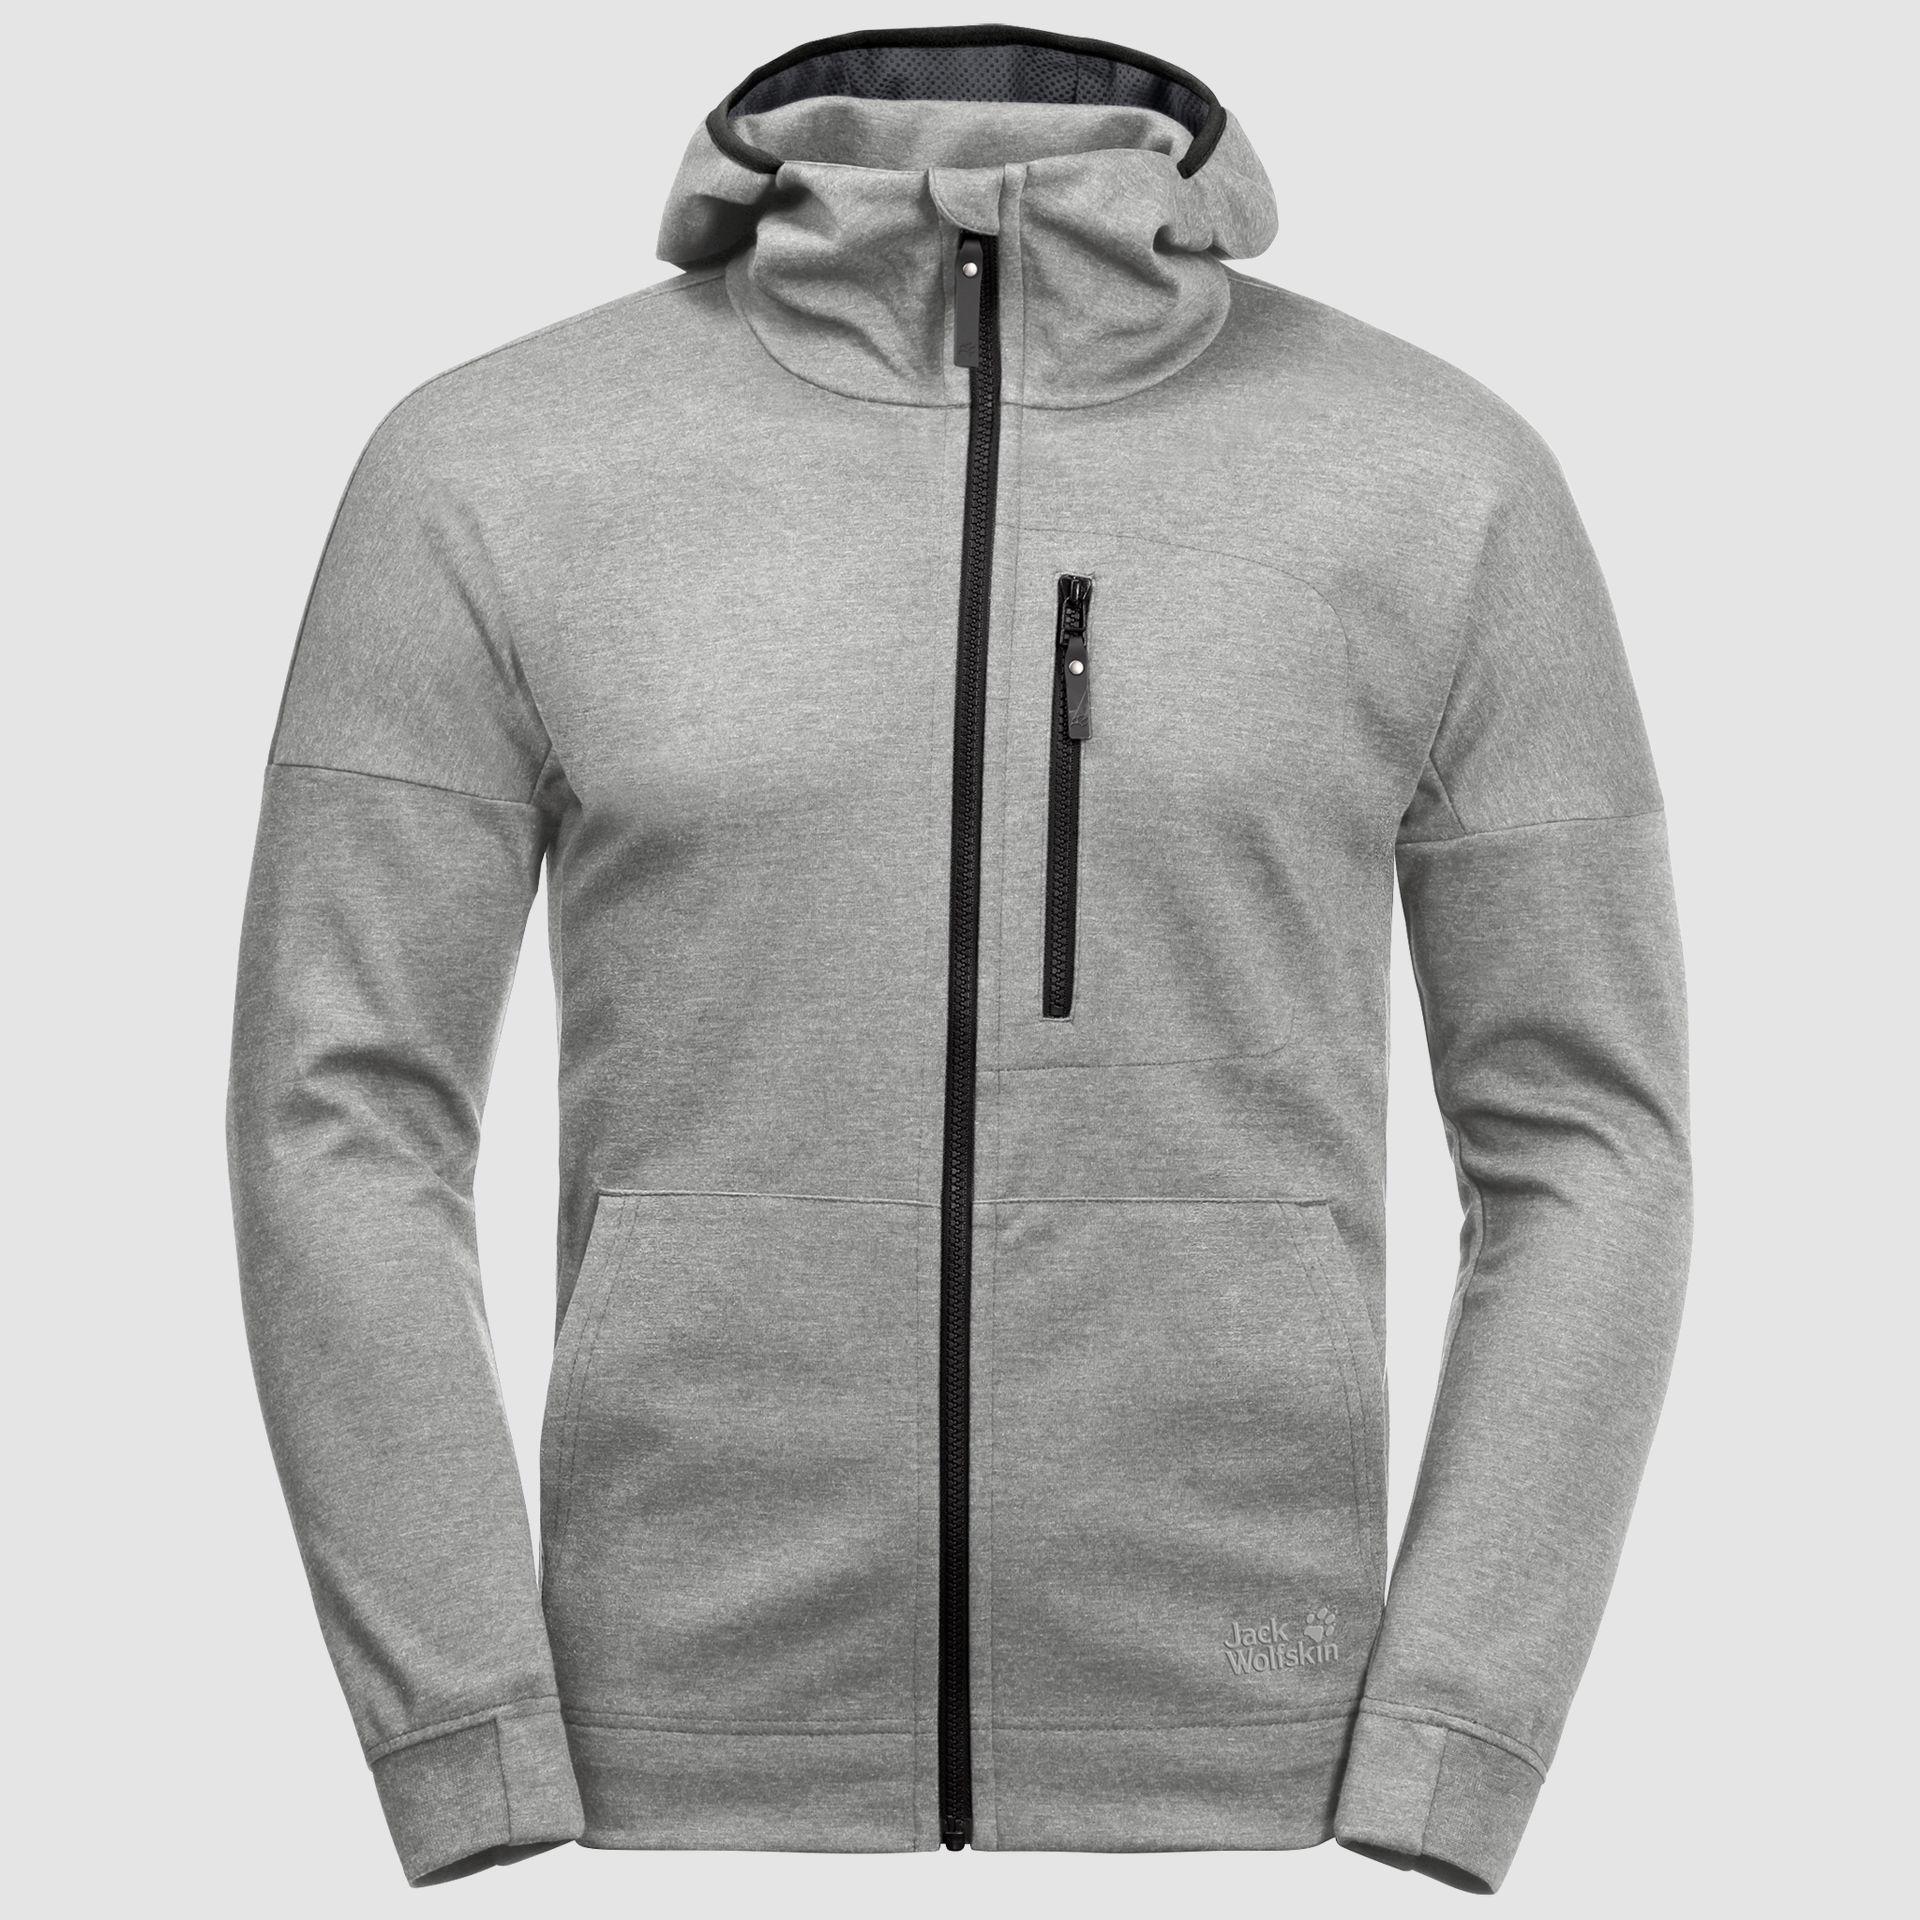 Jack Wolfskin Riverland Hooded Jacket M Fleece Jacket Men Jack Wolfskin Herbstjacken Jacken Und Kapuzenjacke